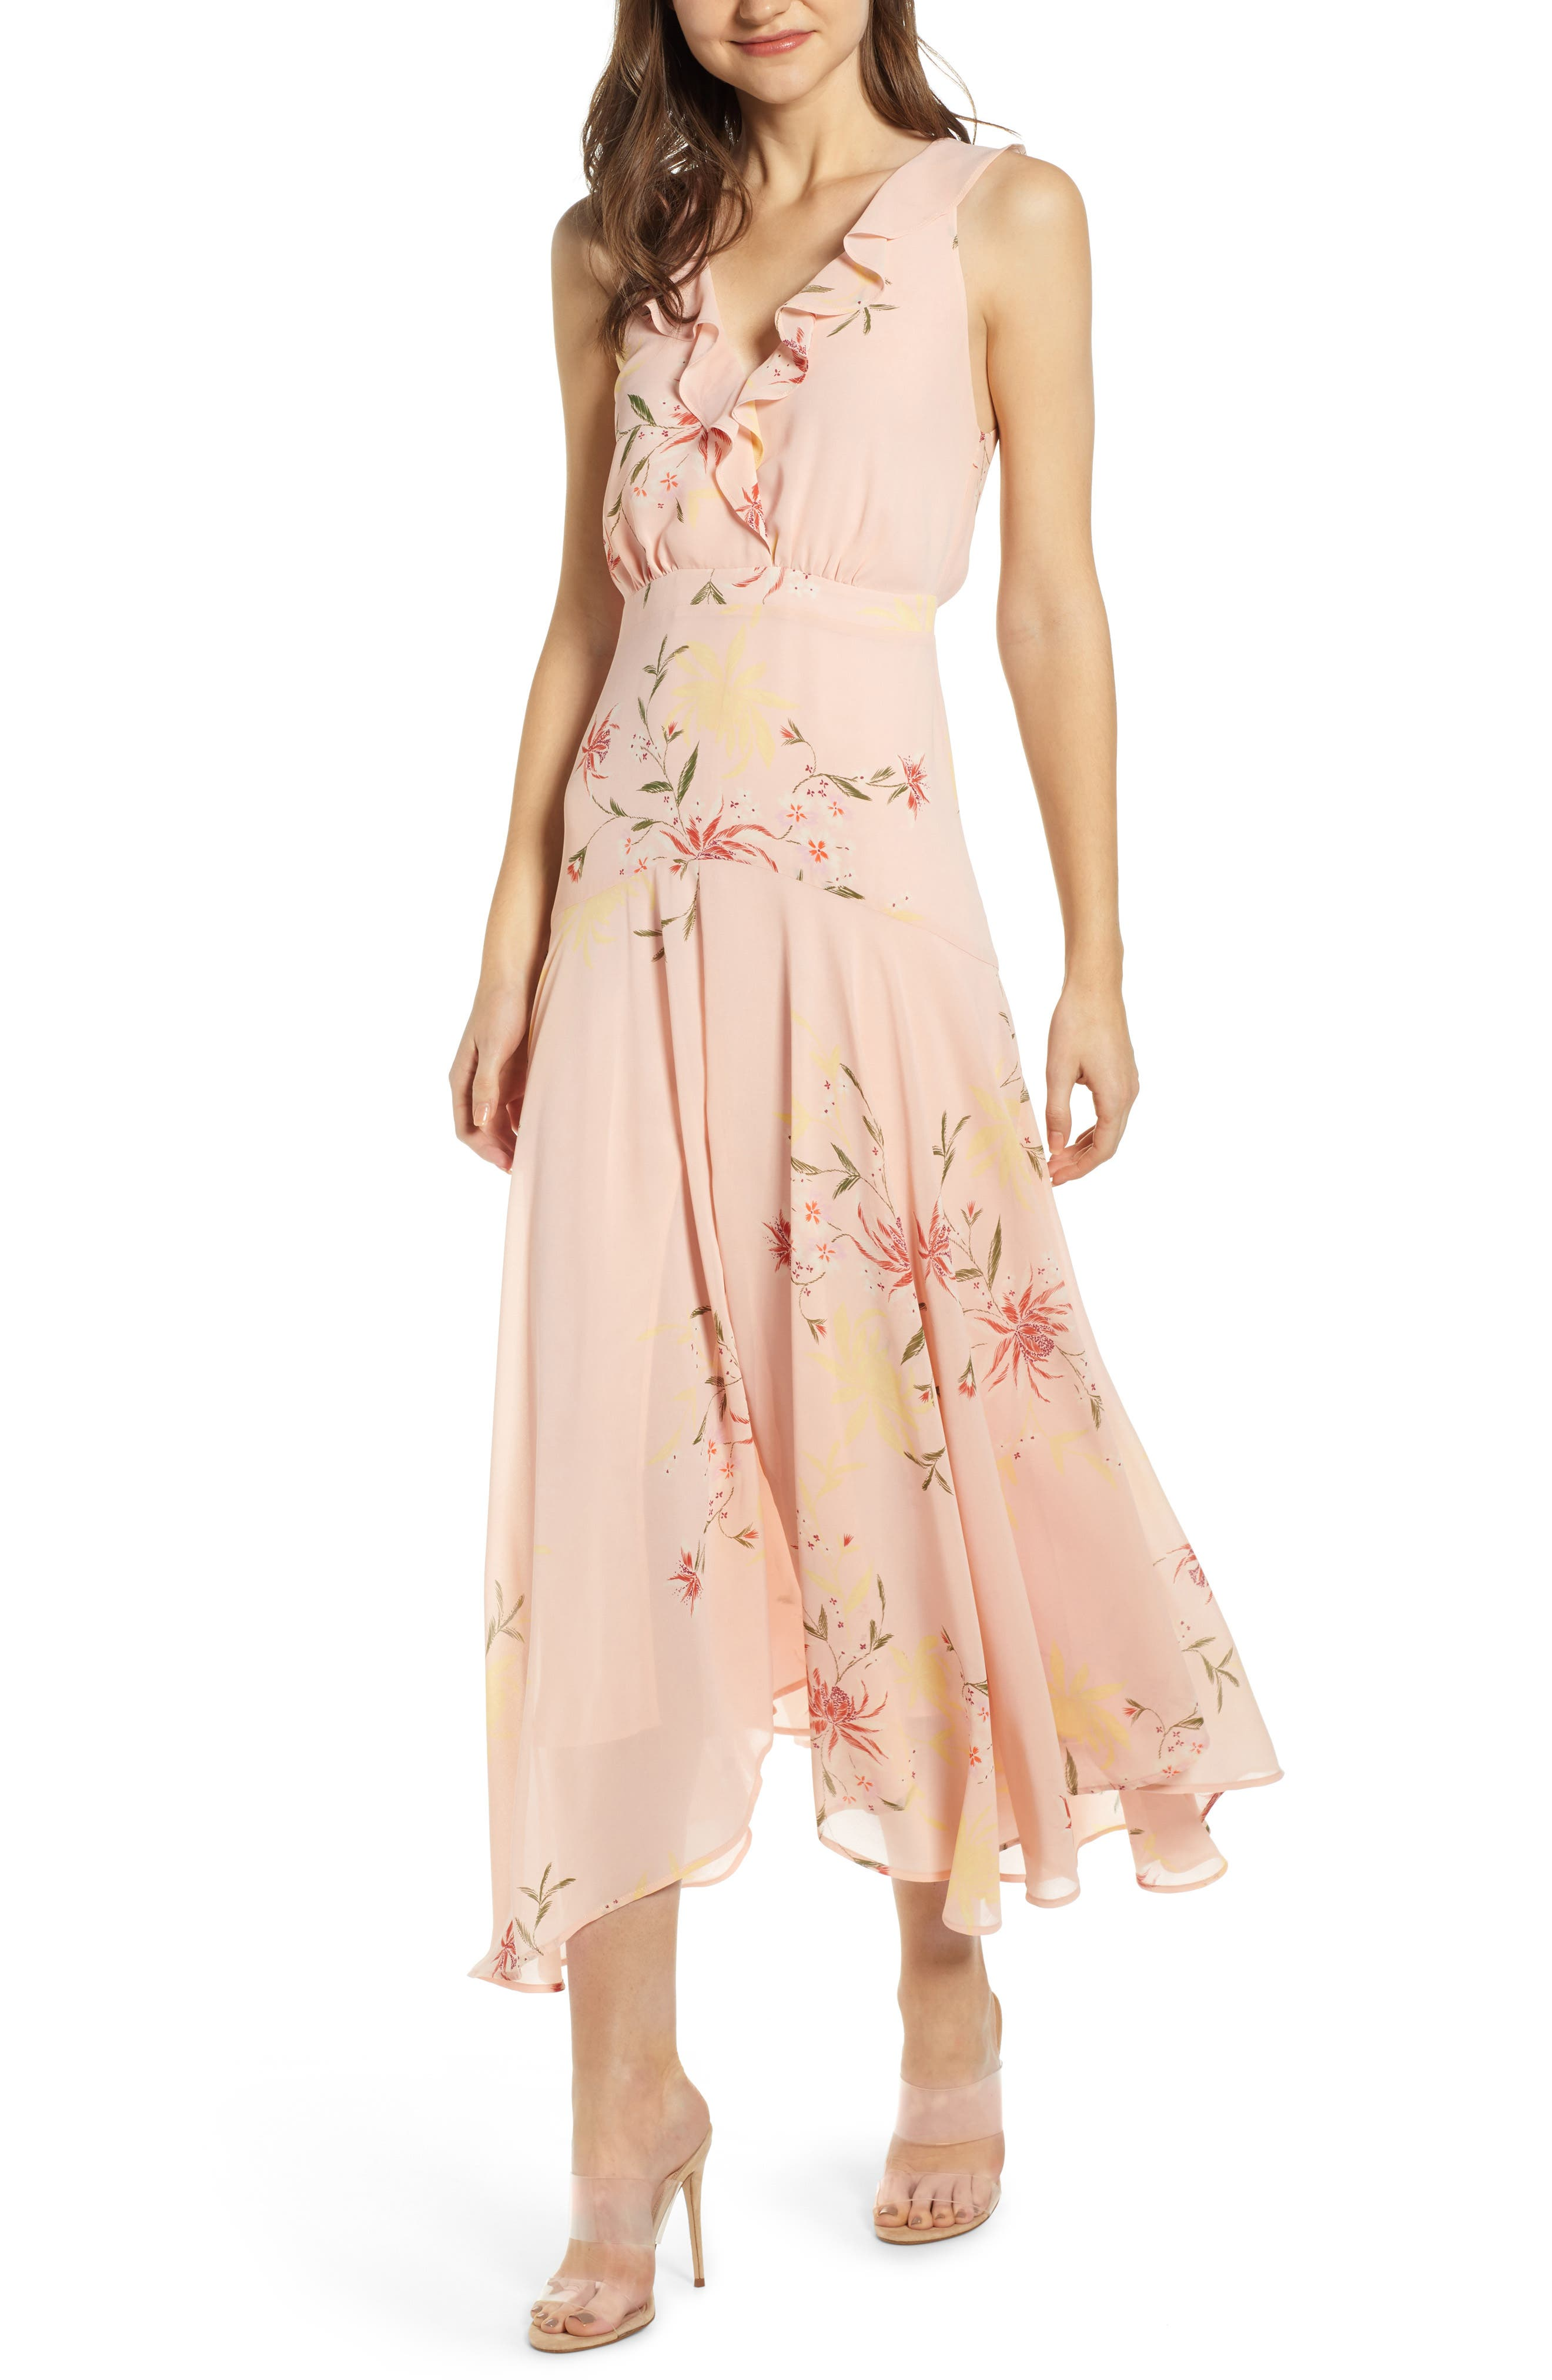 Ruffle Detail High/Low Sleeveless Maxi Dress, Main, color, 950